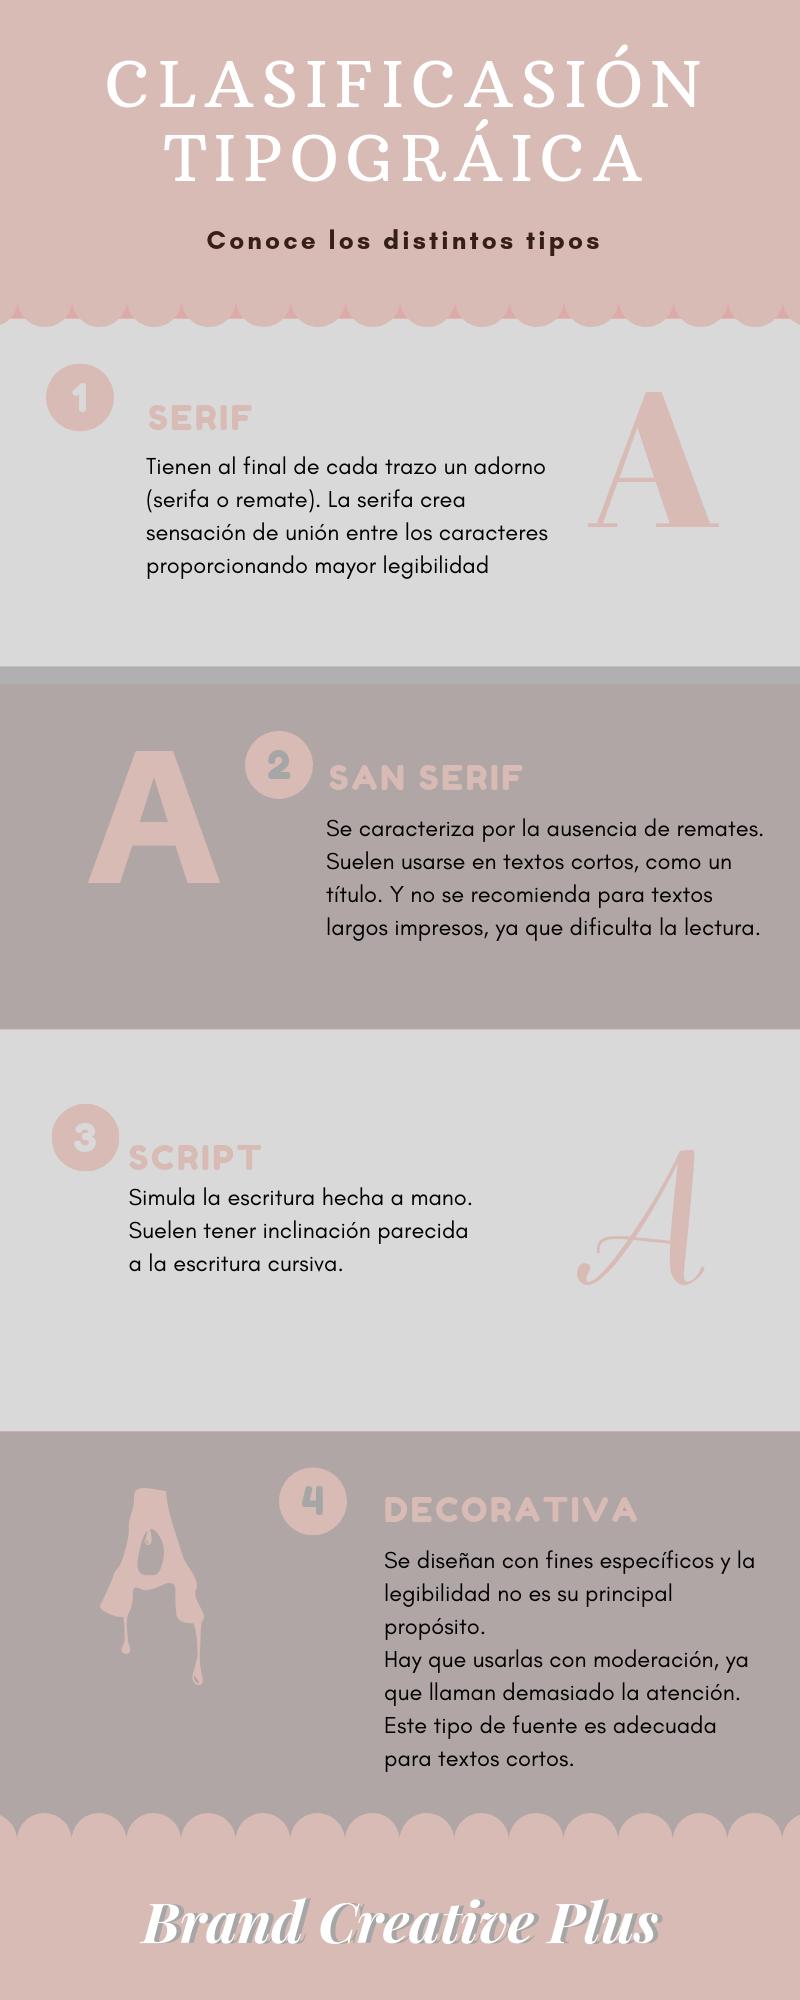 Brandcreativeplus Com Alfabeto De Tipografía Tipografia Serif Serif